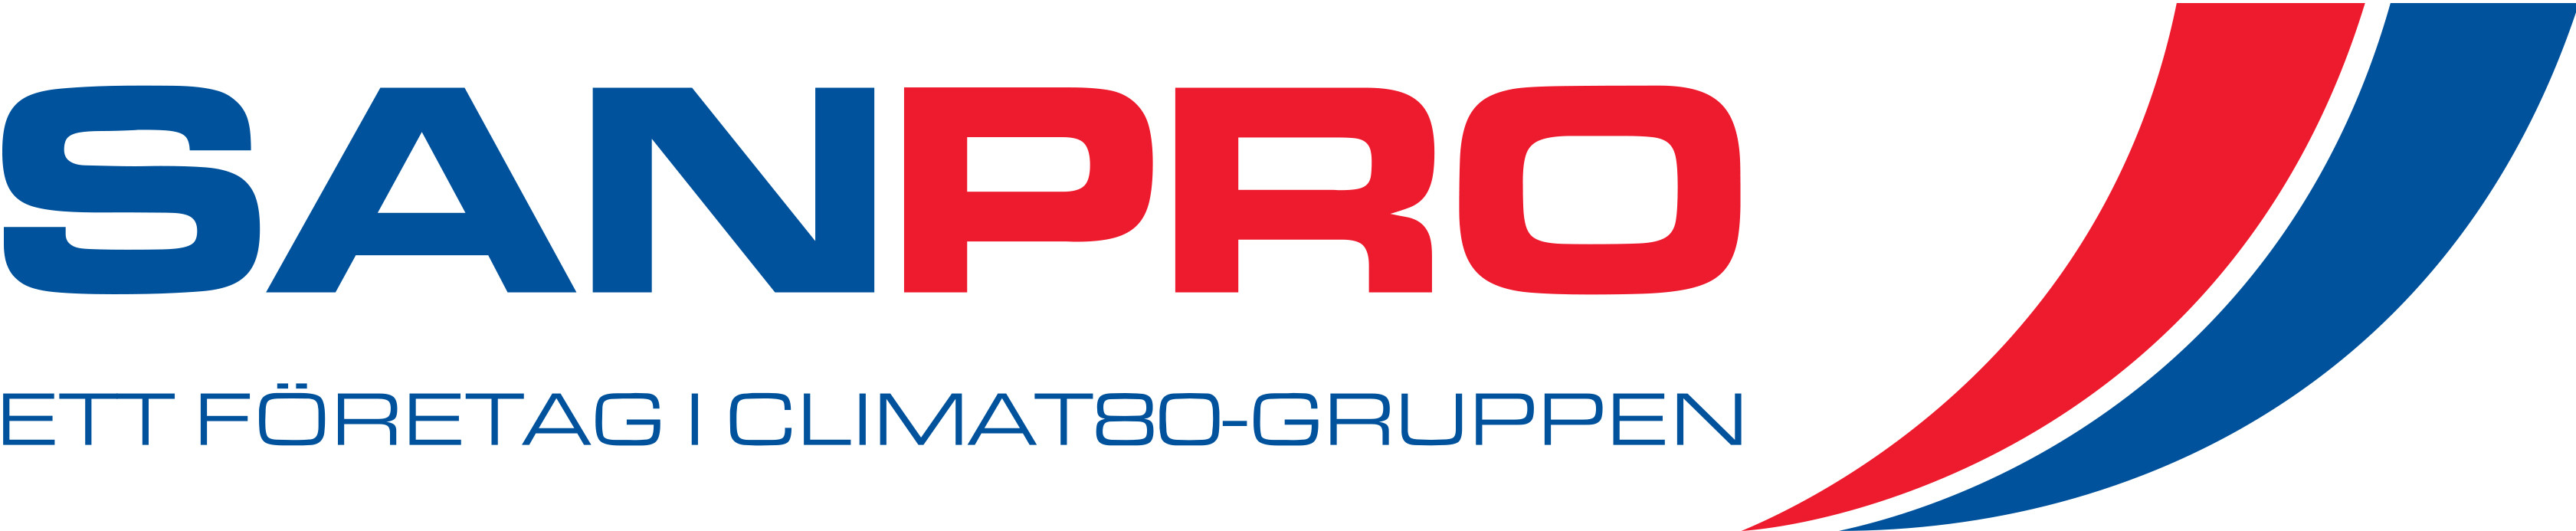 sanpro_logo_flow_liggande_tagg.jpg